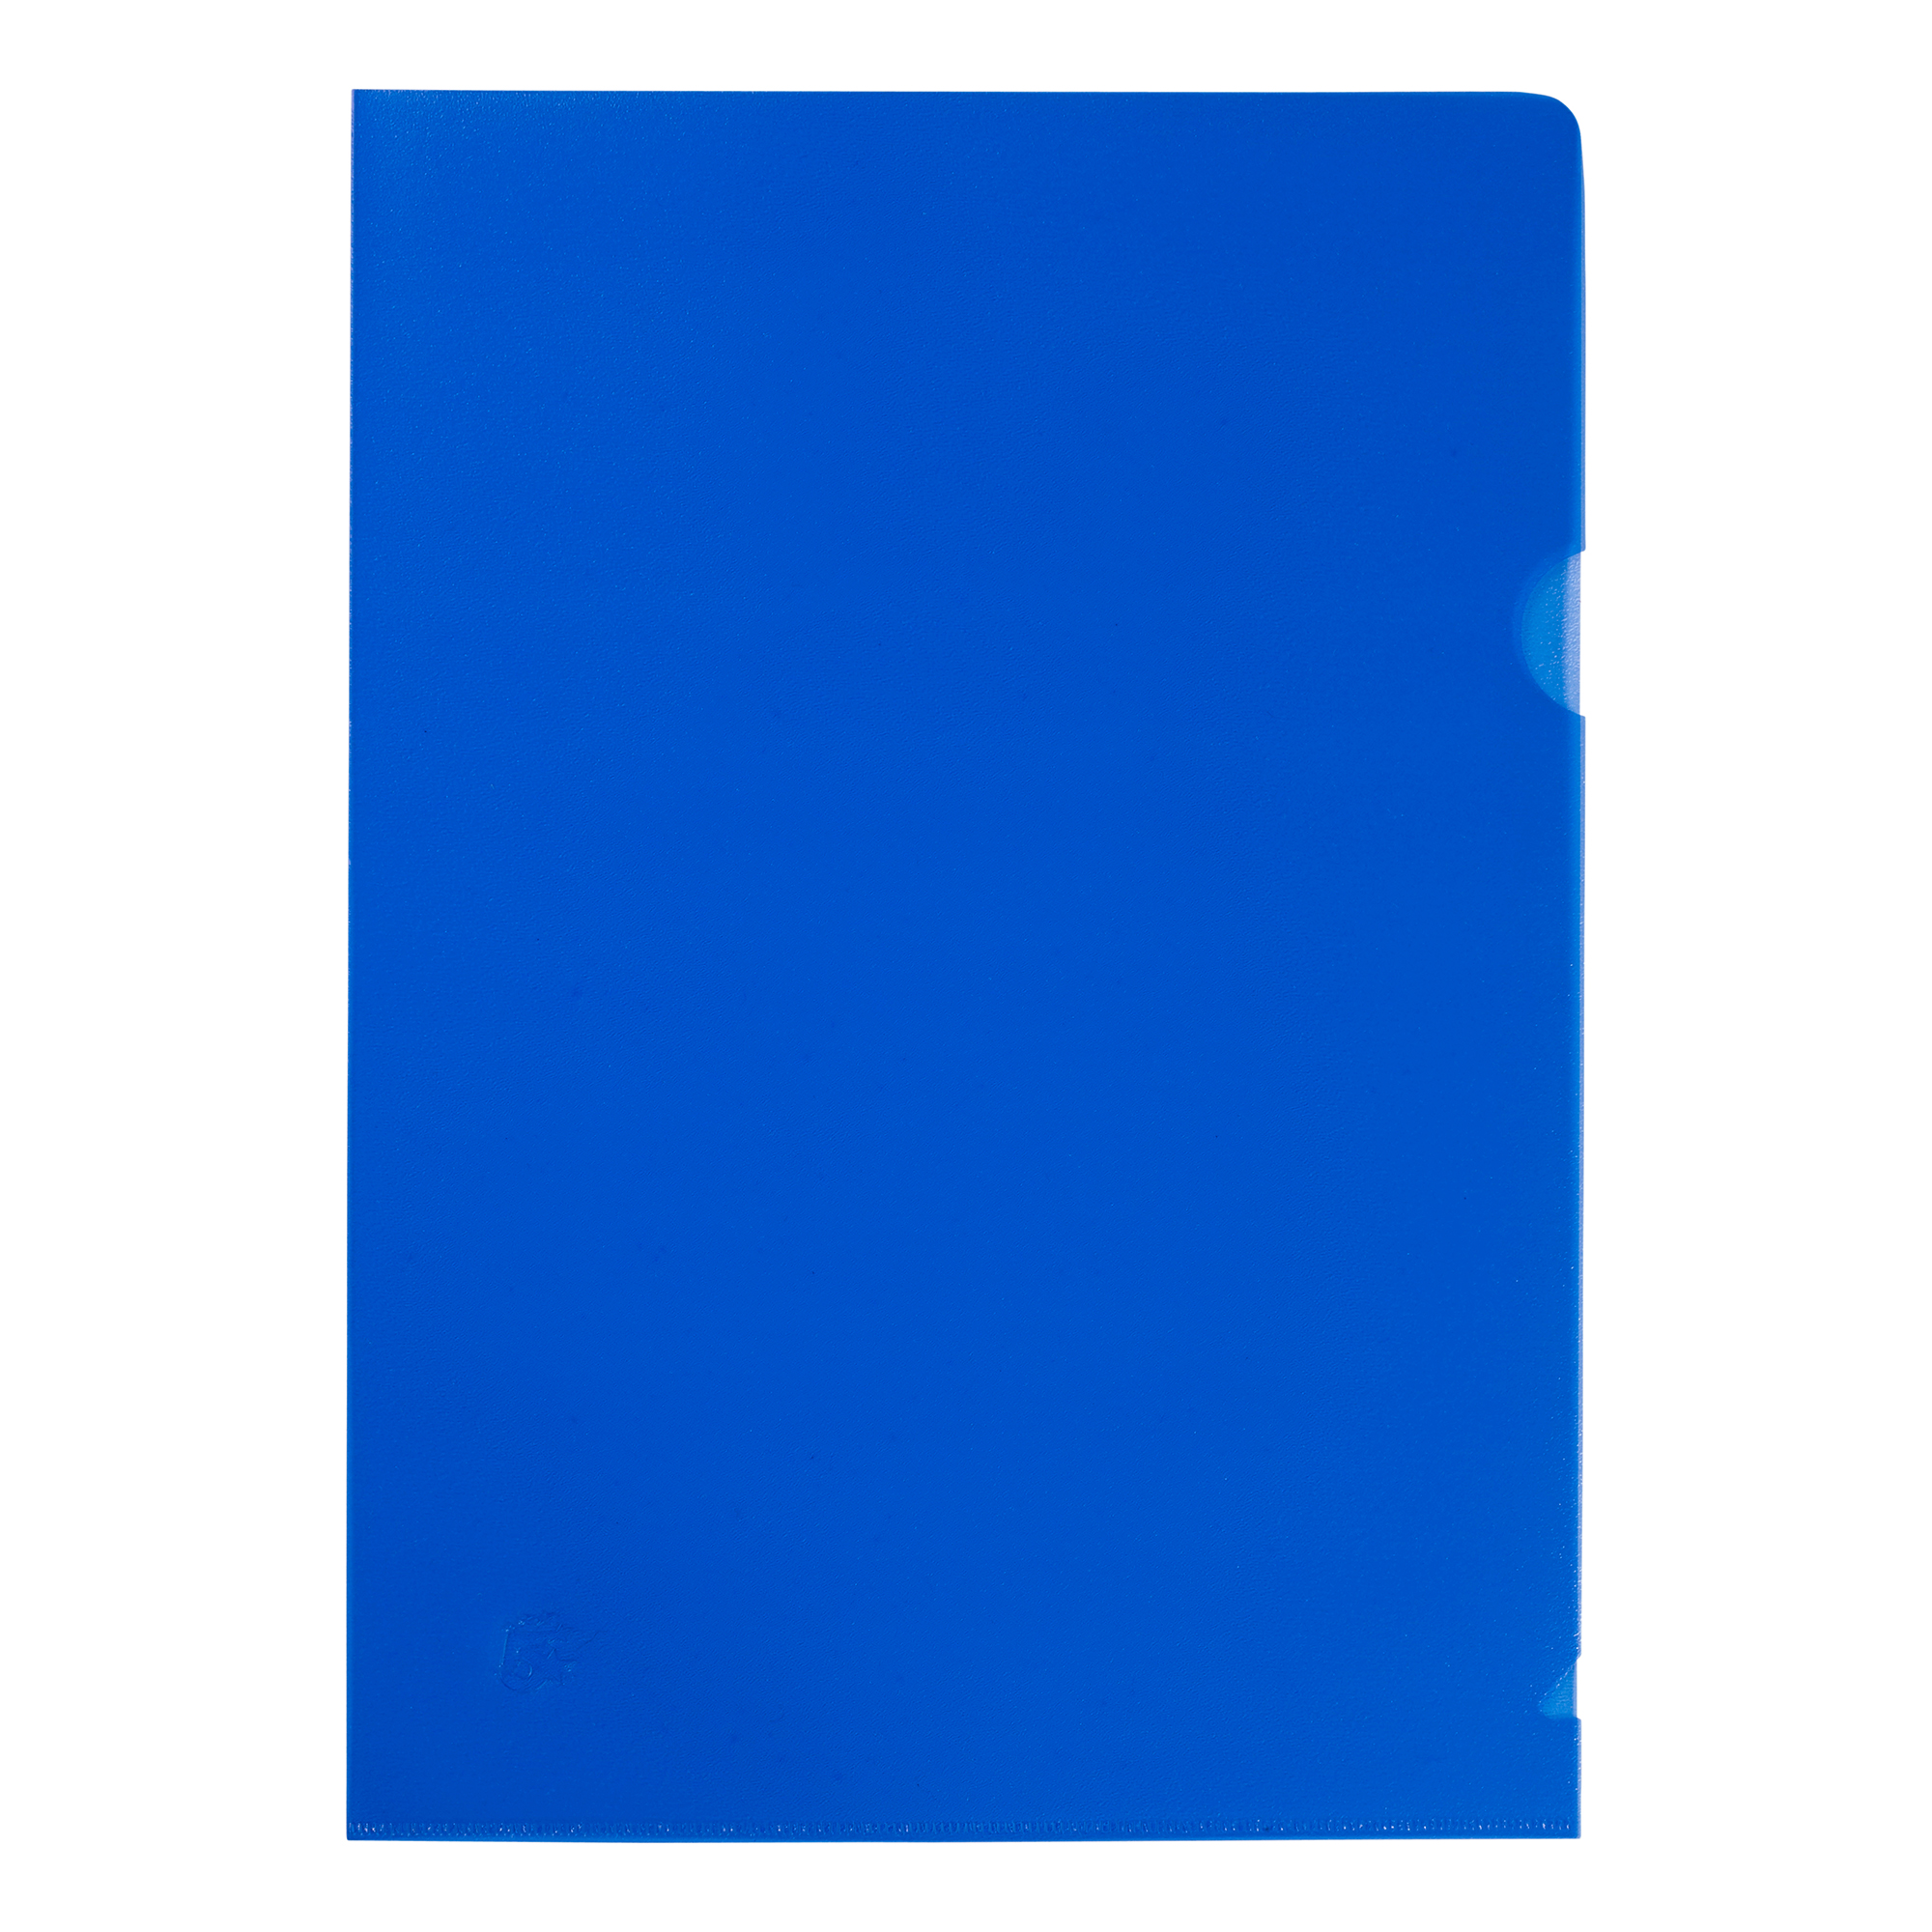 5 Star Office Folder Embossed Cut Flush Polypropylene Copy-safe Translucent 110 Micron A4 Blue Pack 25